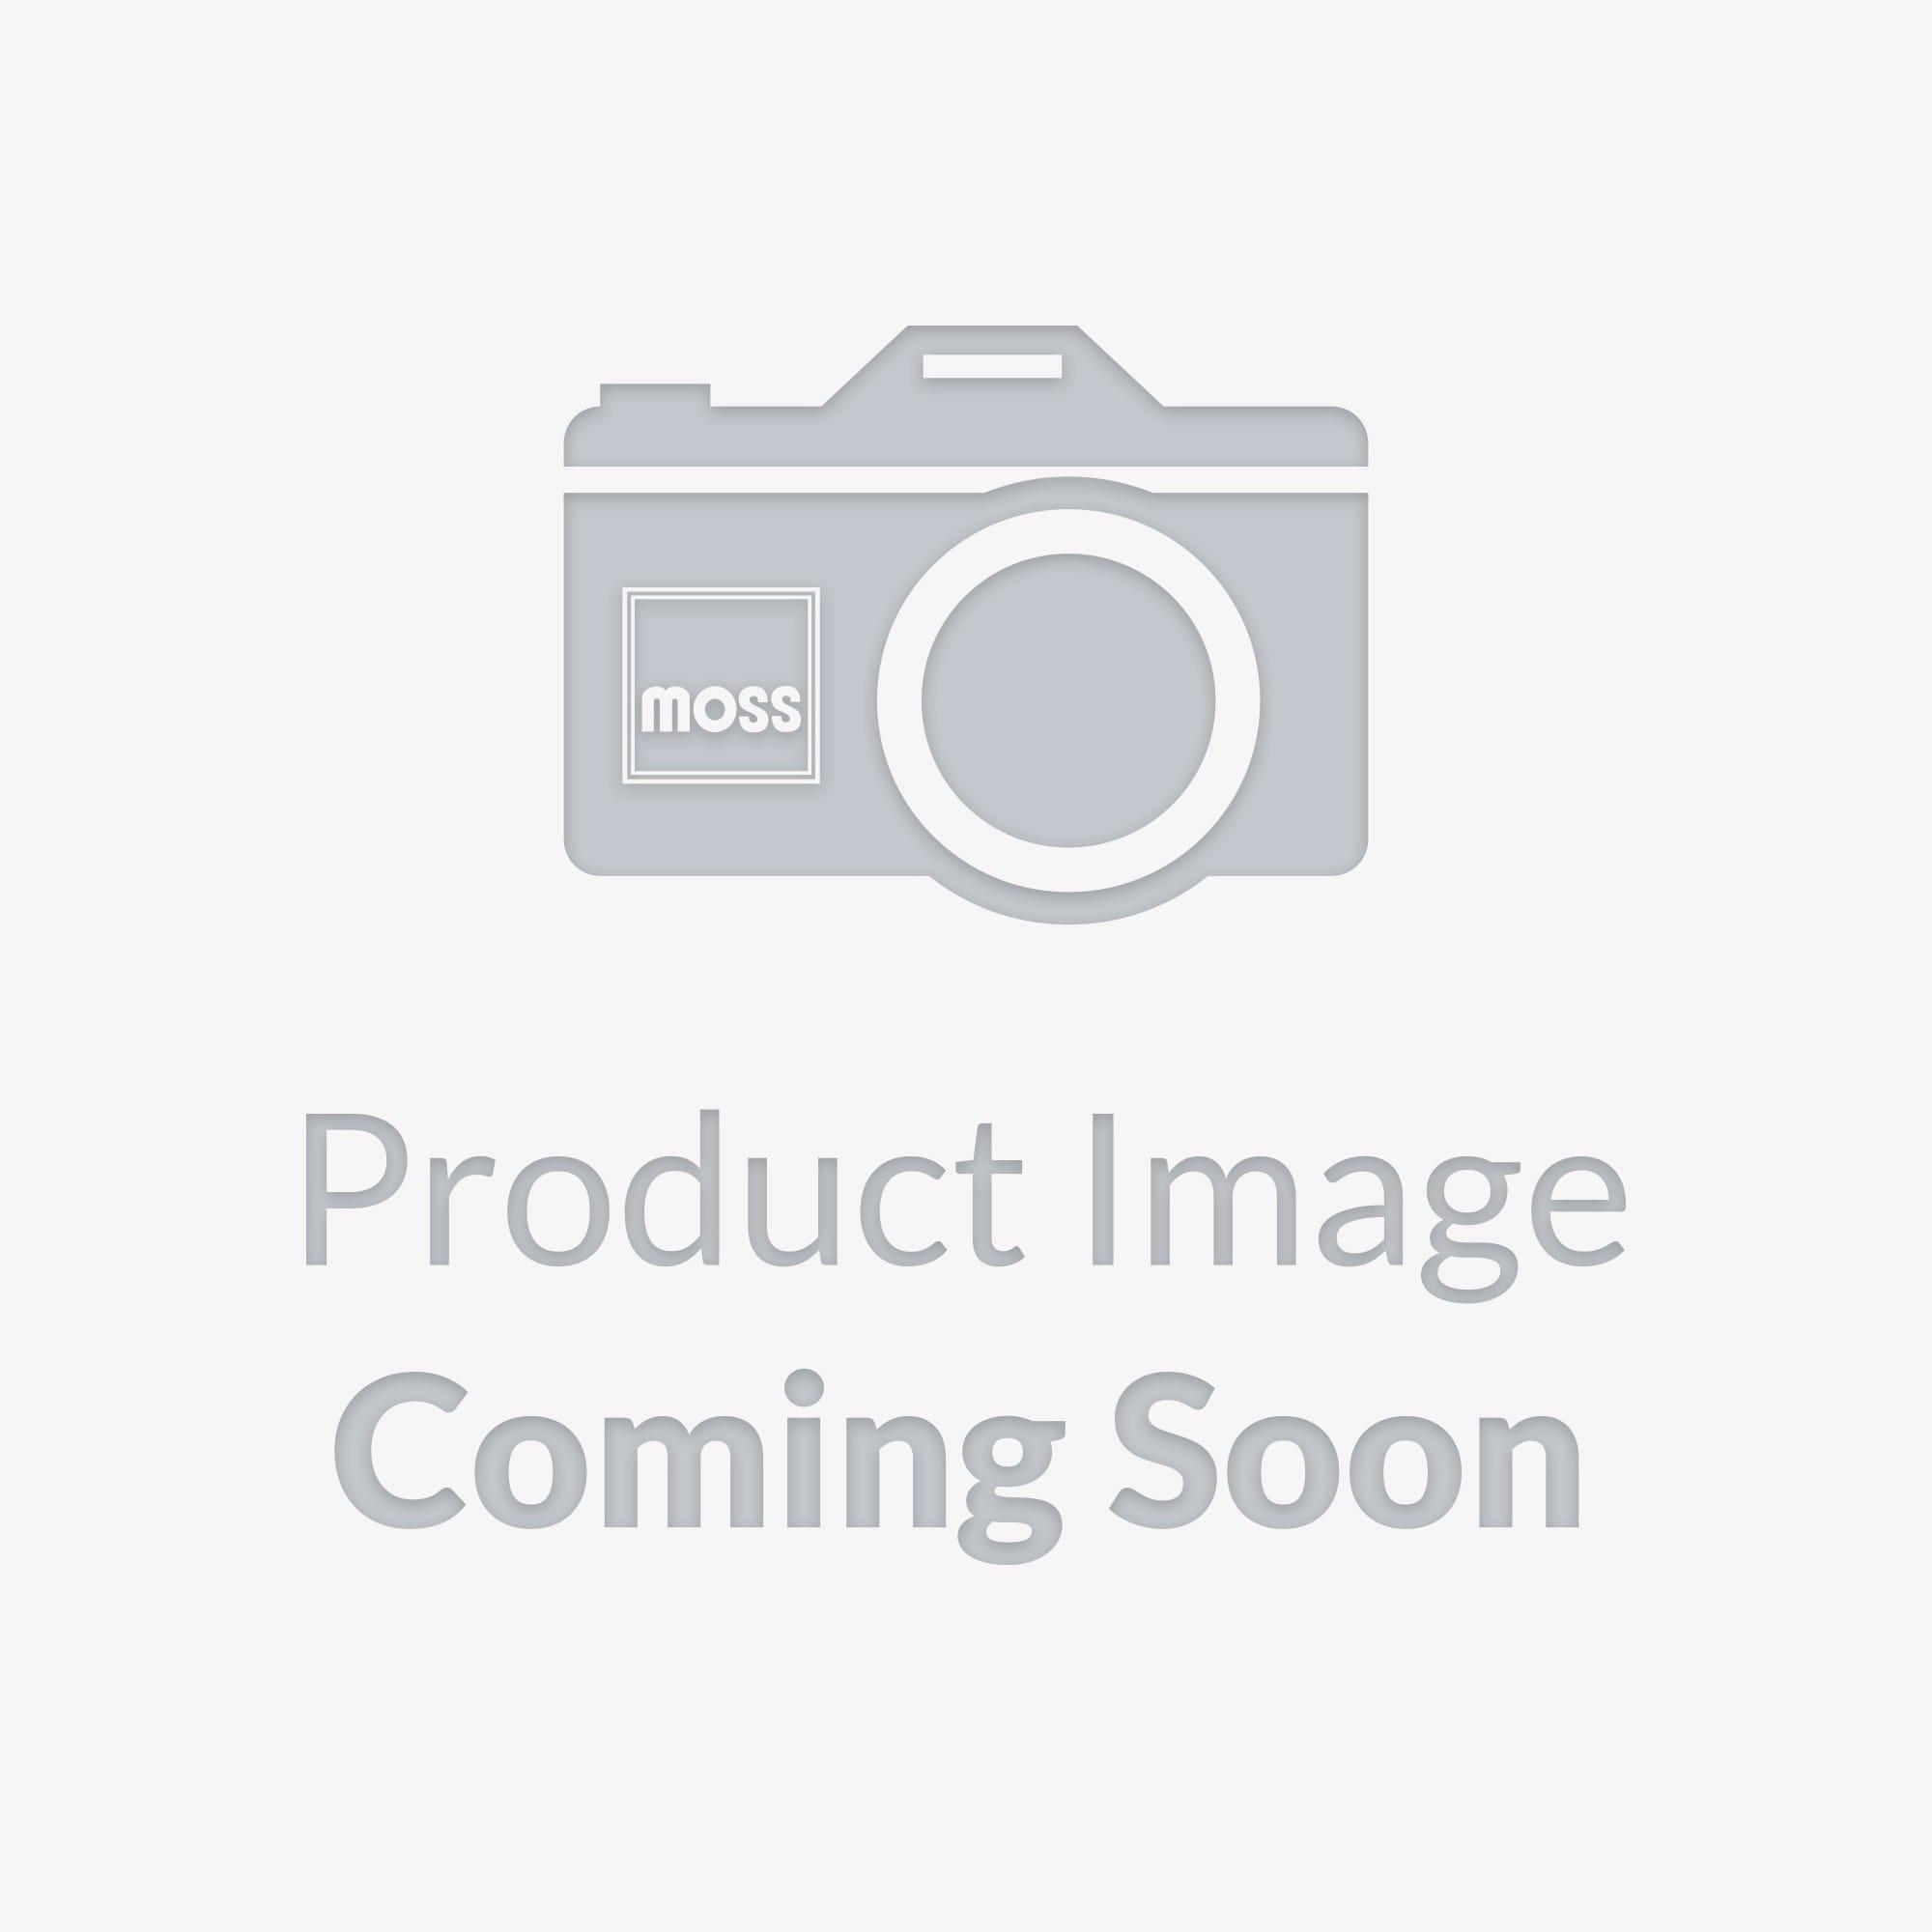 Custom deluxe interior kits complete interior kits upholstery interior trim mgb moss - Kit de interior ...